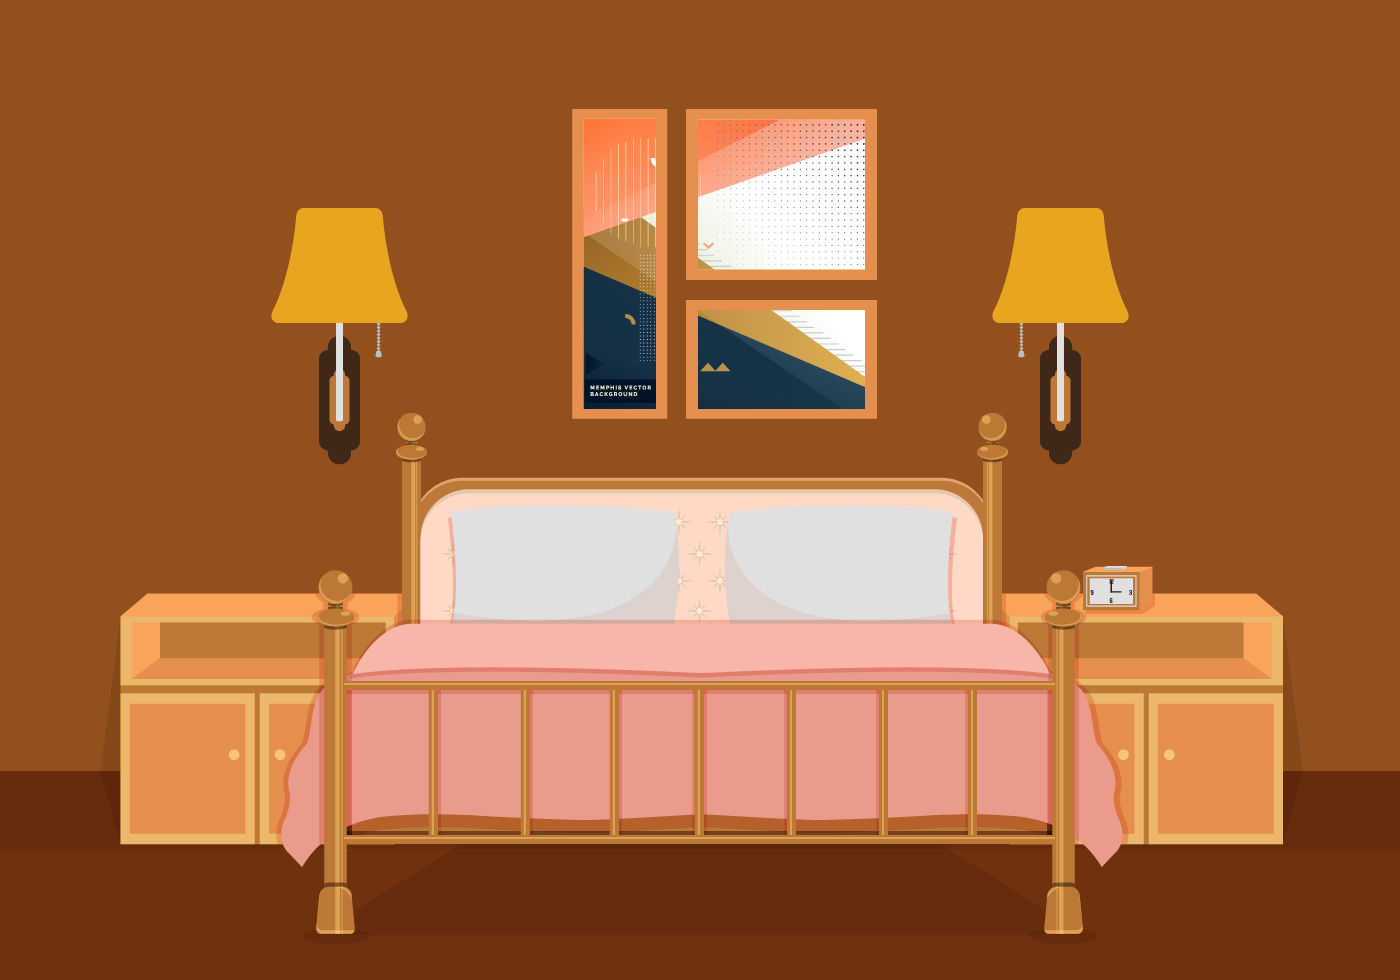 Interior of bedroom vector illustration download free for Interior design bedroom images free download